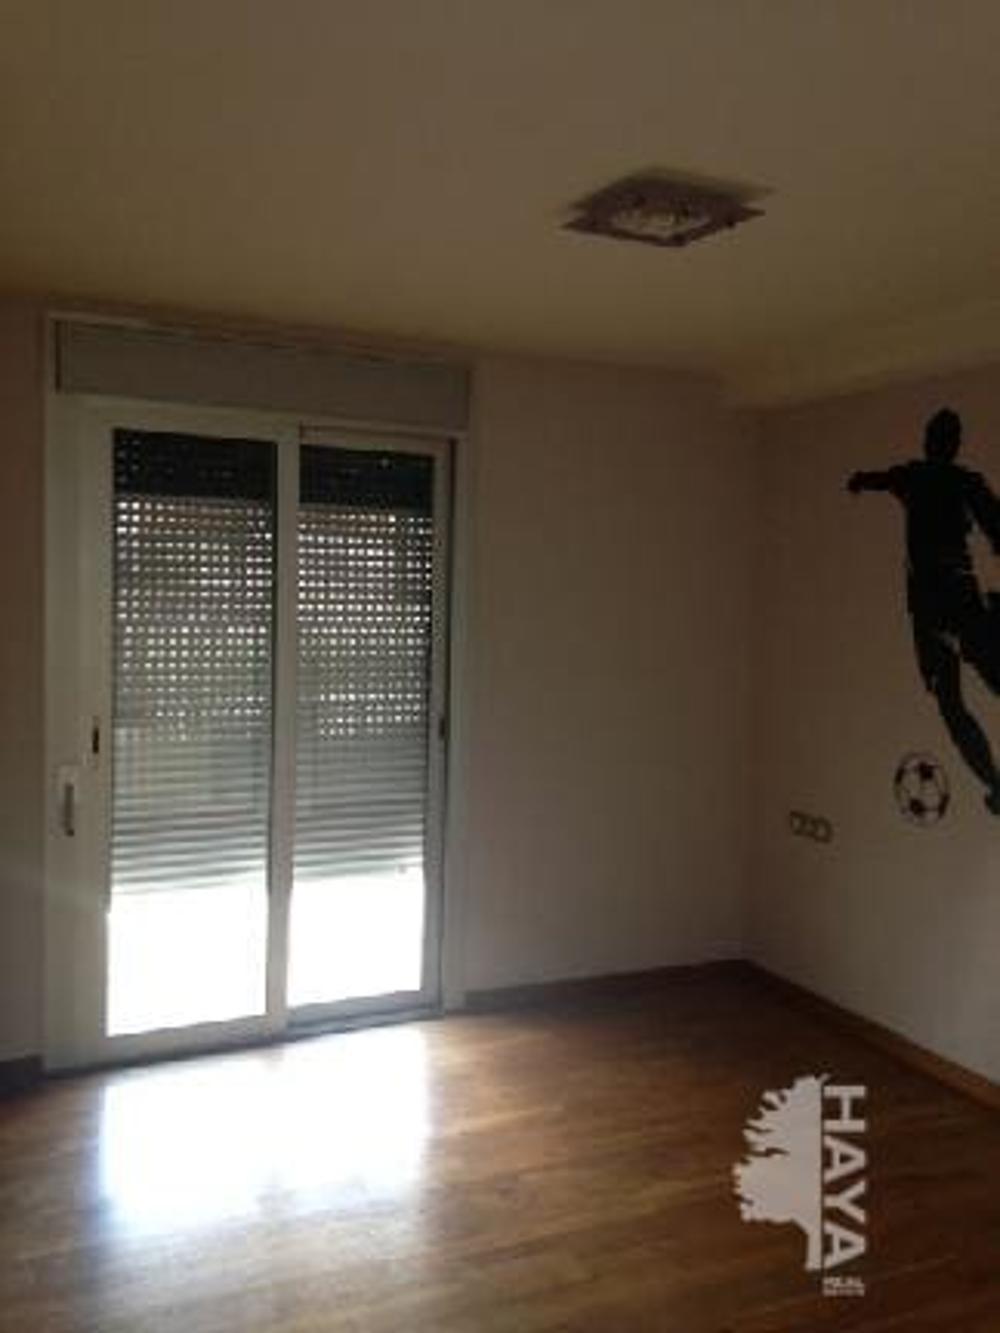 mataró centre 08302 barcelone appartement photo 3042247